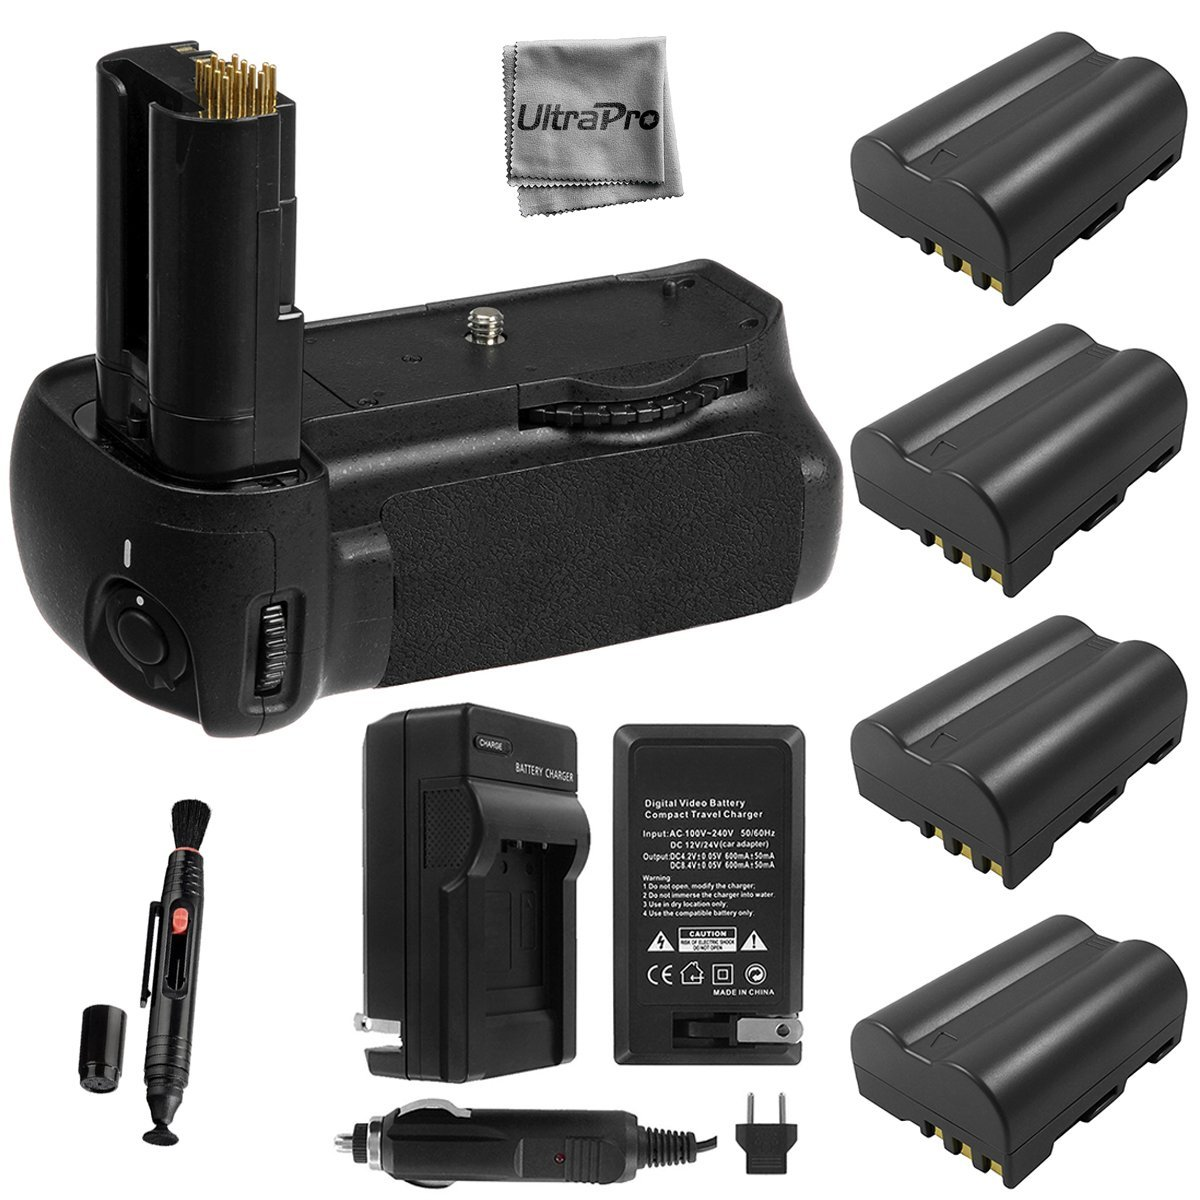 Ultra Pro Battery Grip Bundle F_ Nikon D90 Camera: UltraP...